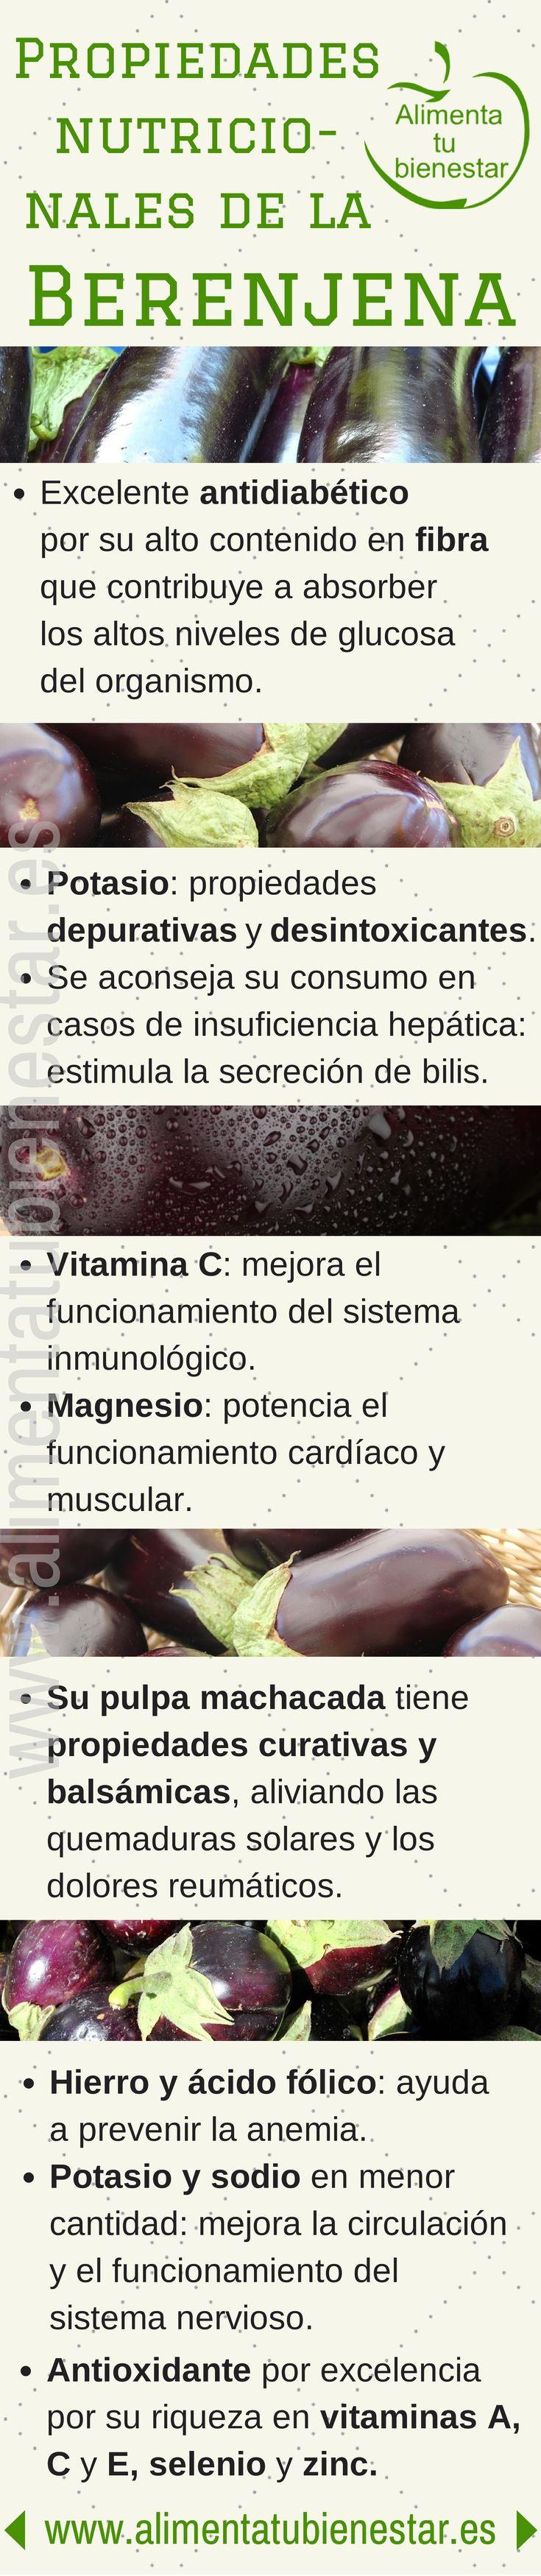 Verduras antioxidantes: las berenjenas